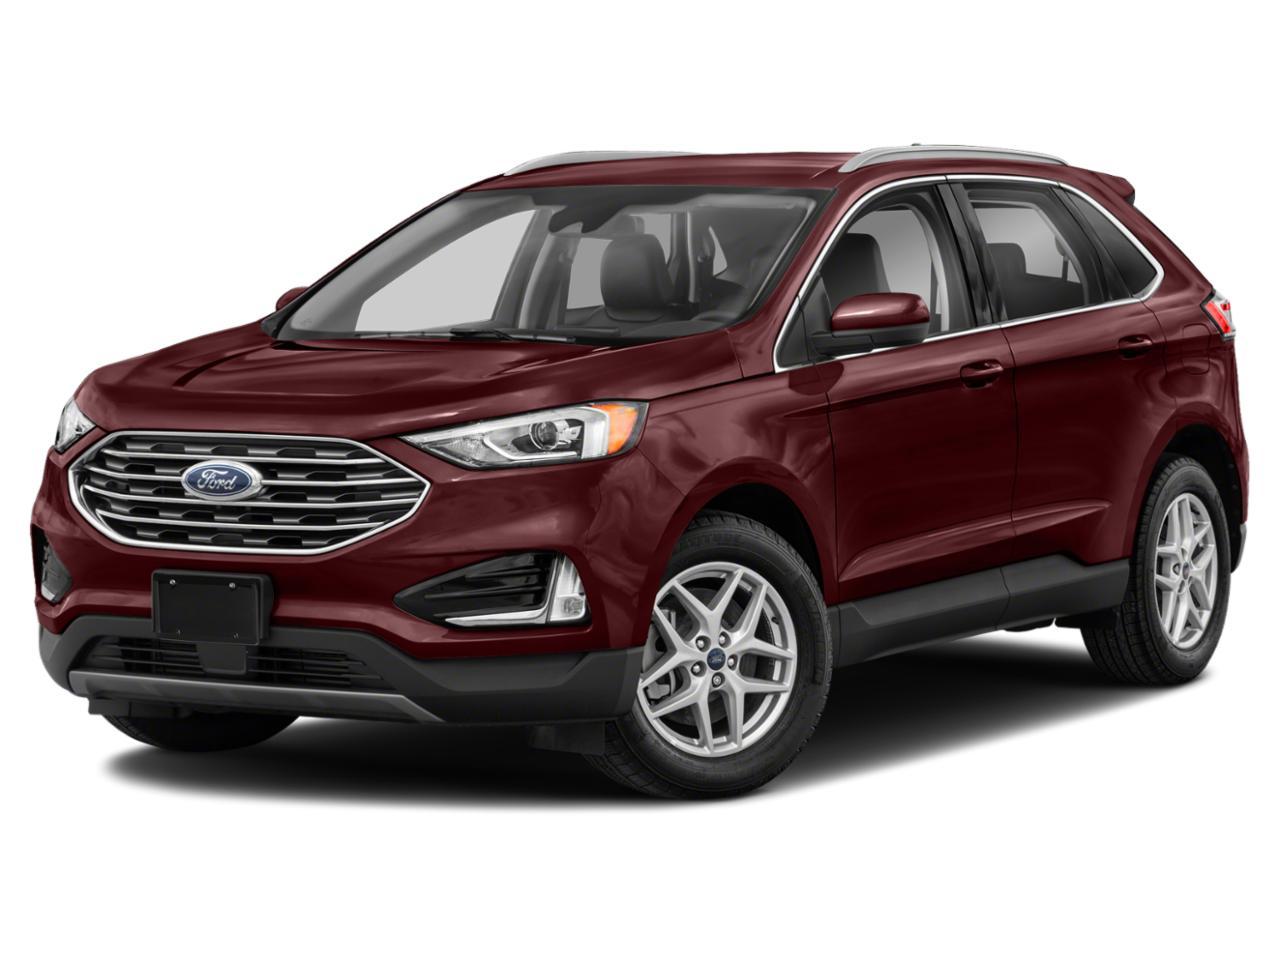 2021 Ford Edge Vehicle Photo in Oshkosh, WI 54901-1209